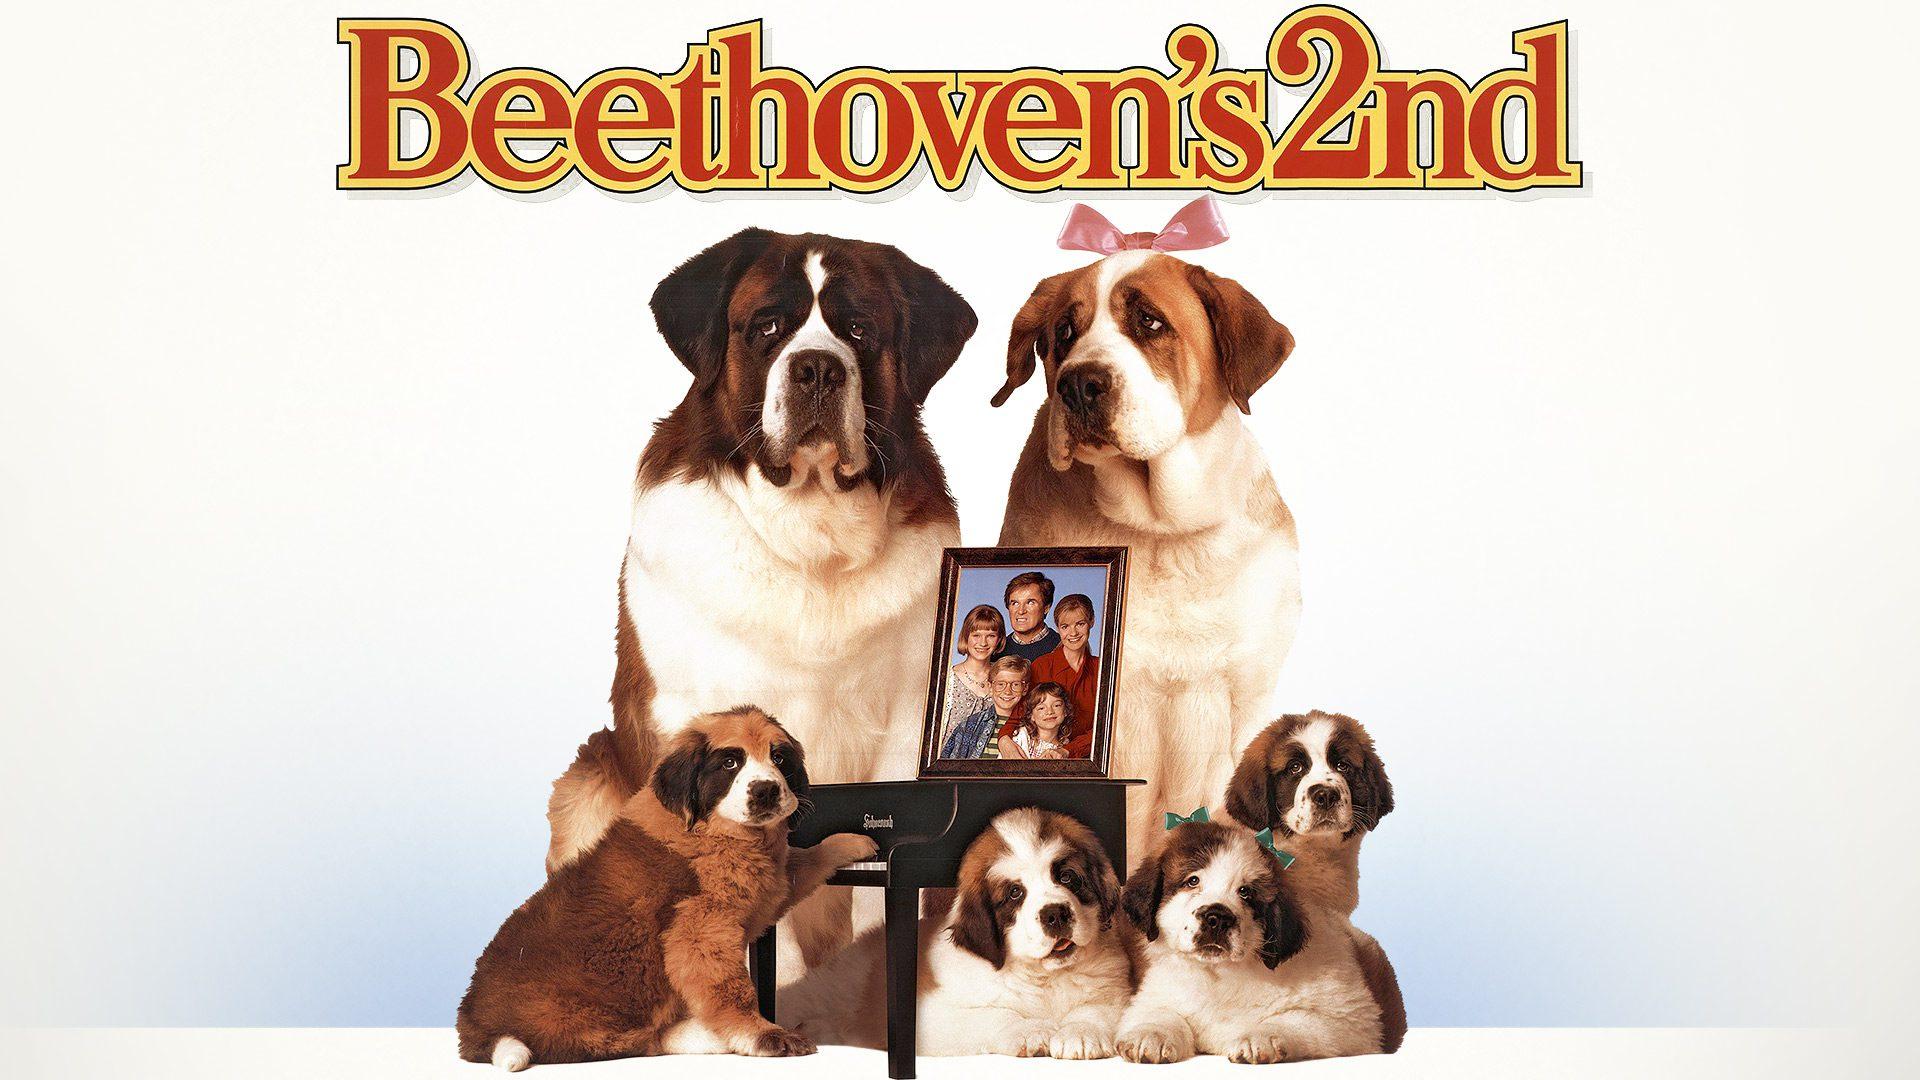 where was beethoven 2 filmed